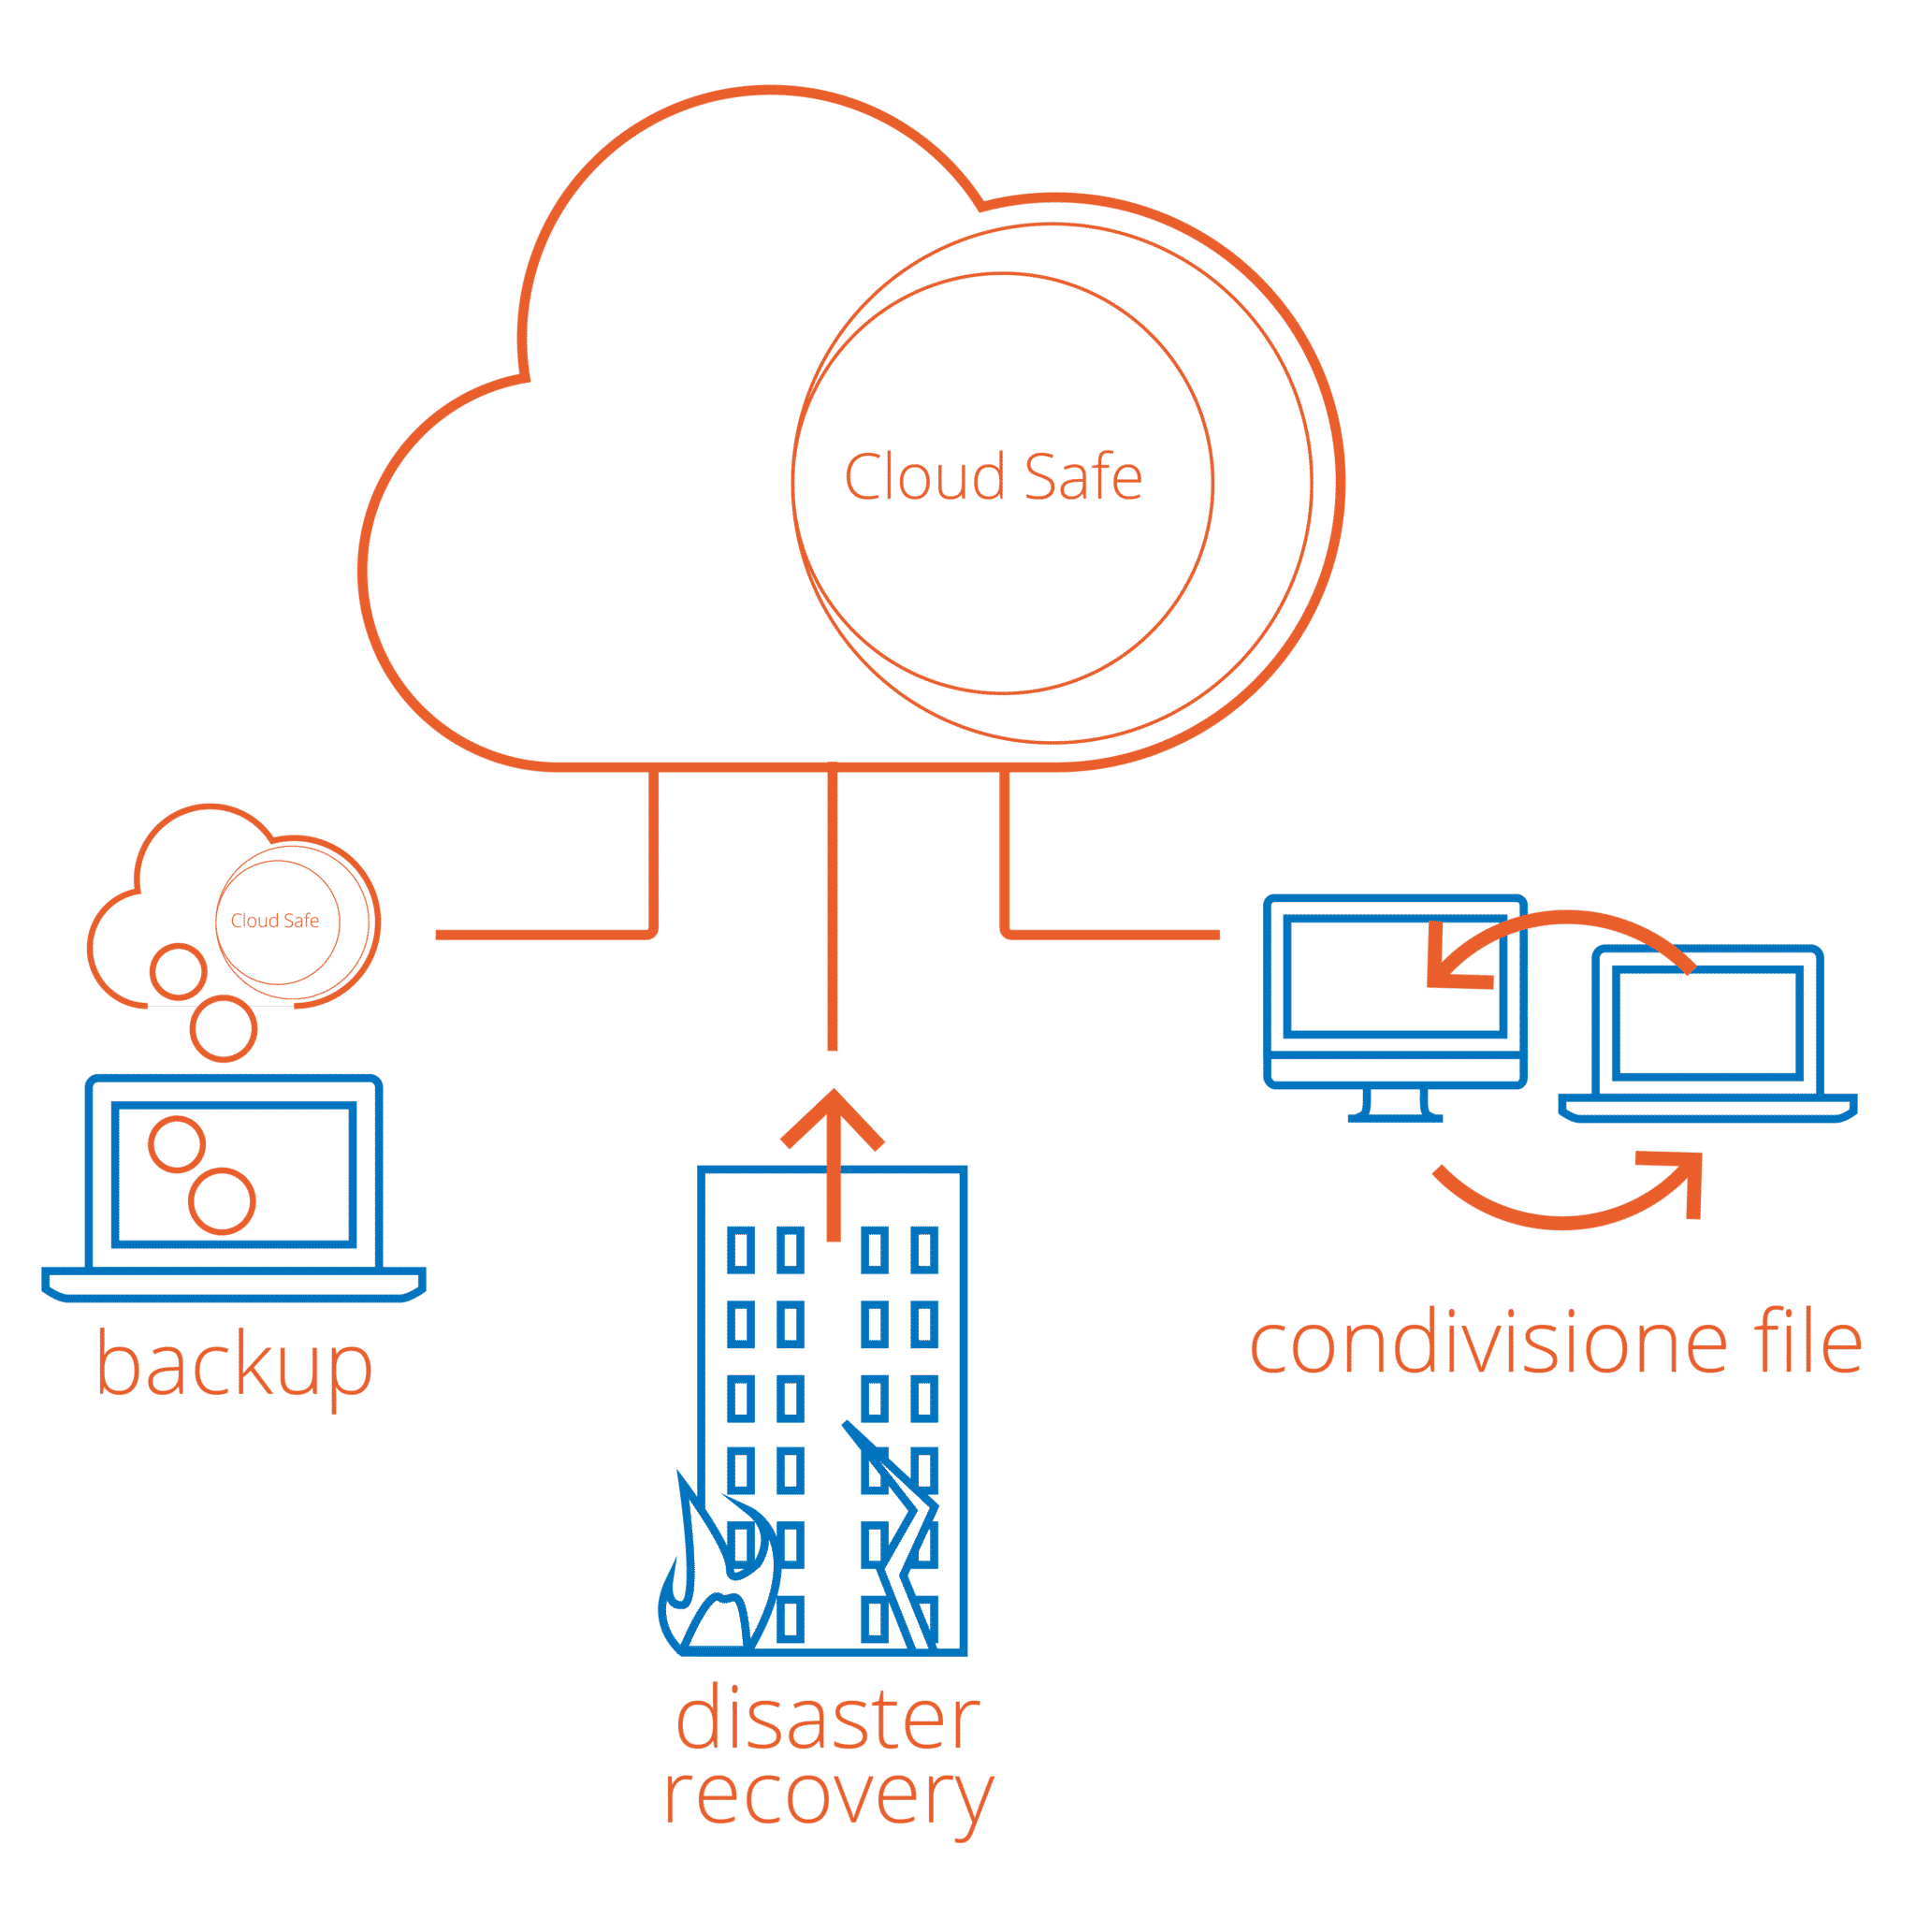 cloudsafe-servizi